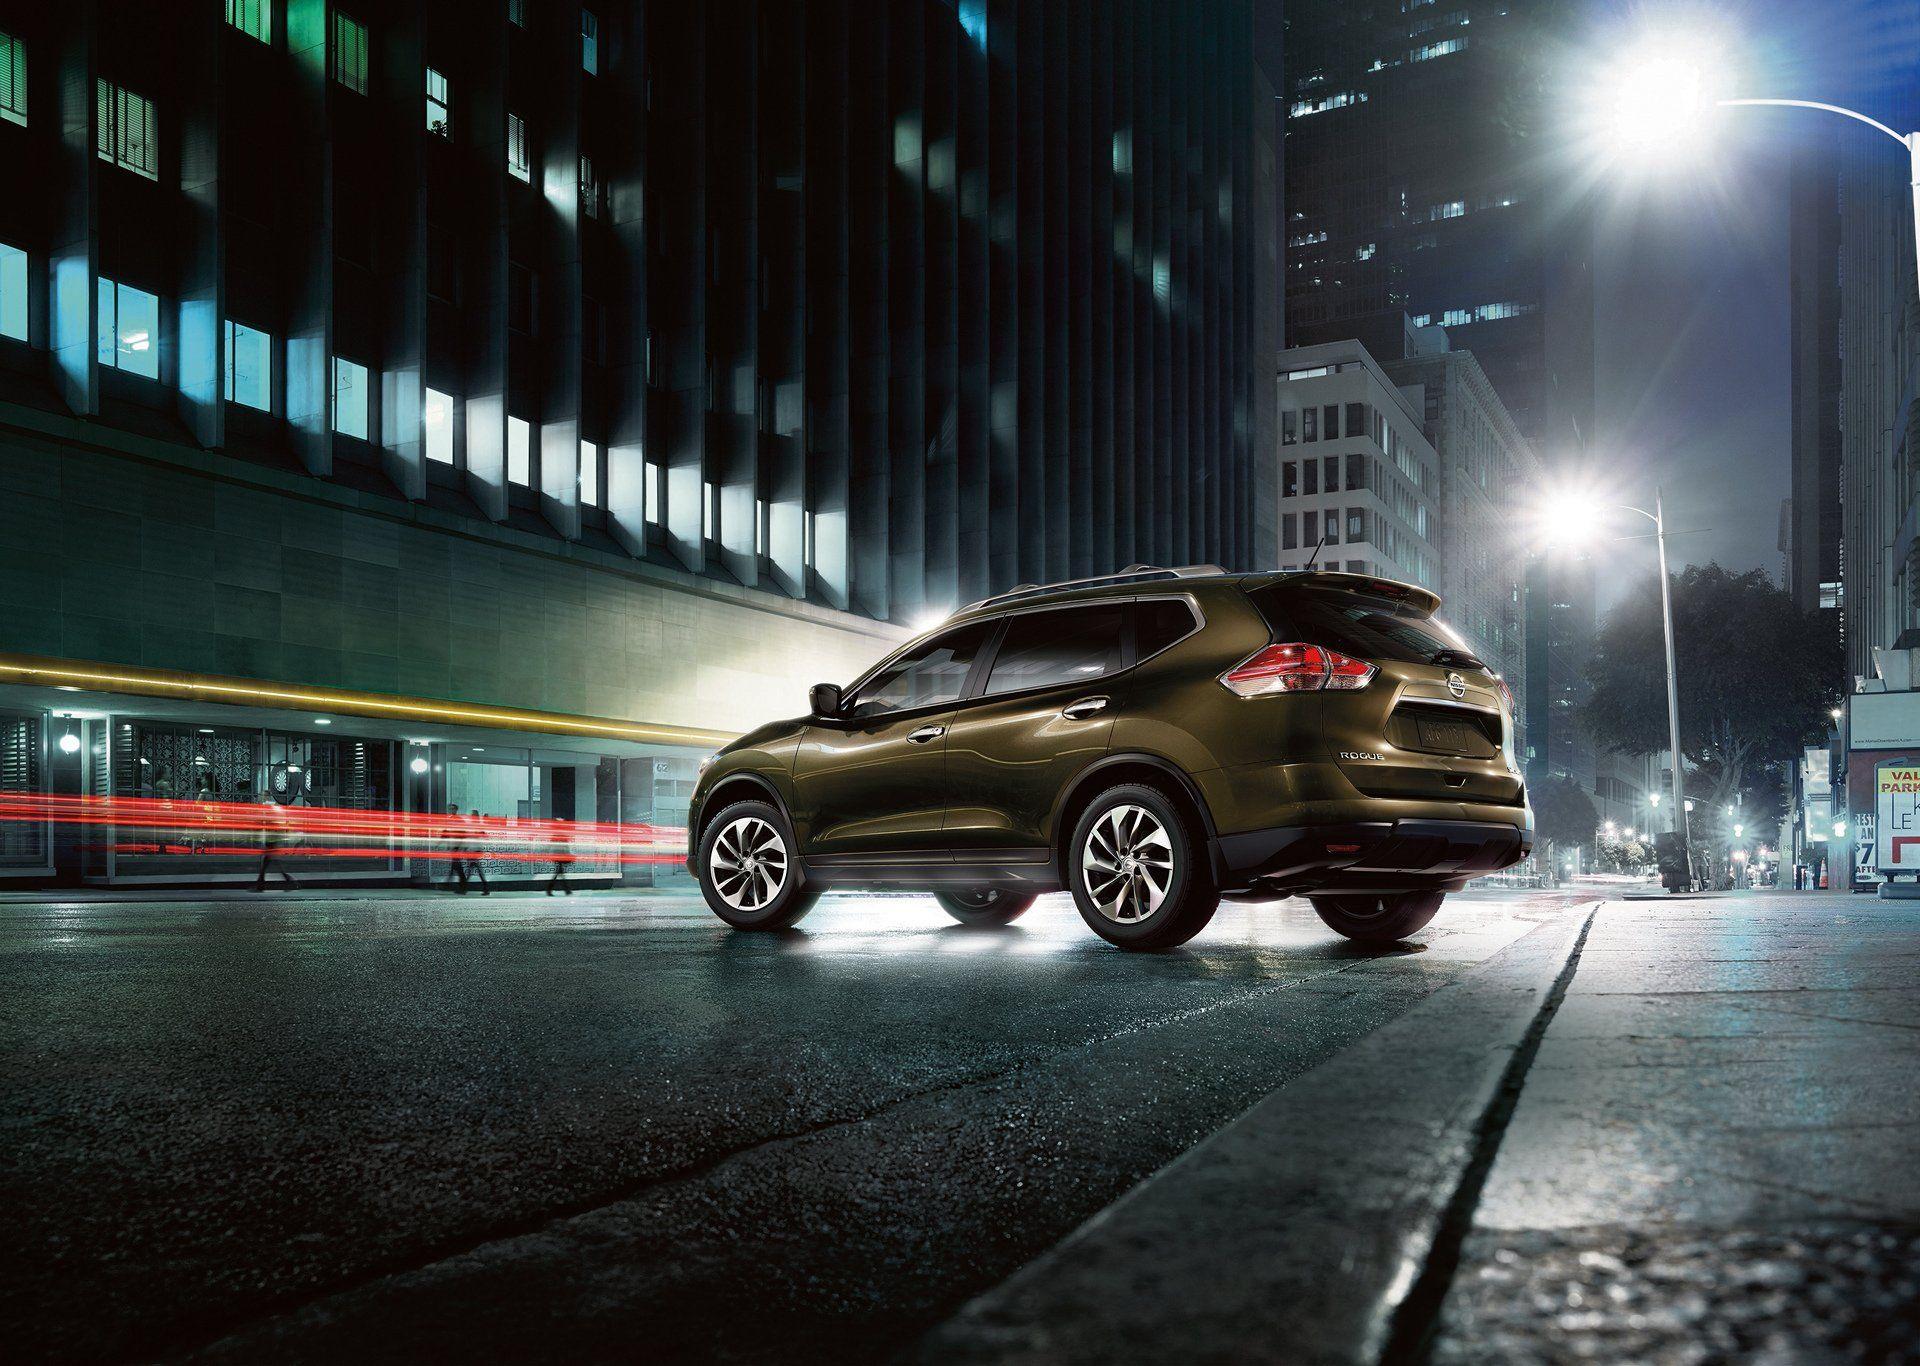 2016 Nissan Rogue Review Carrrs Auto Portal Nissan